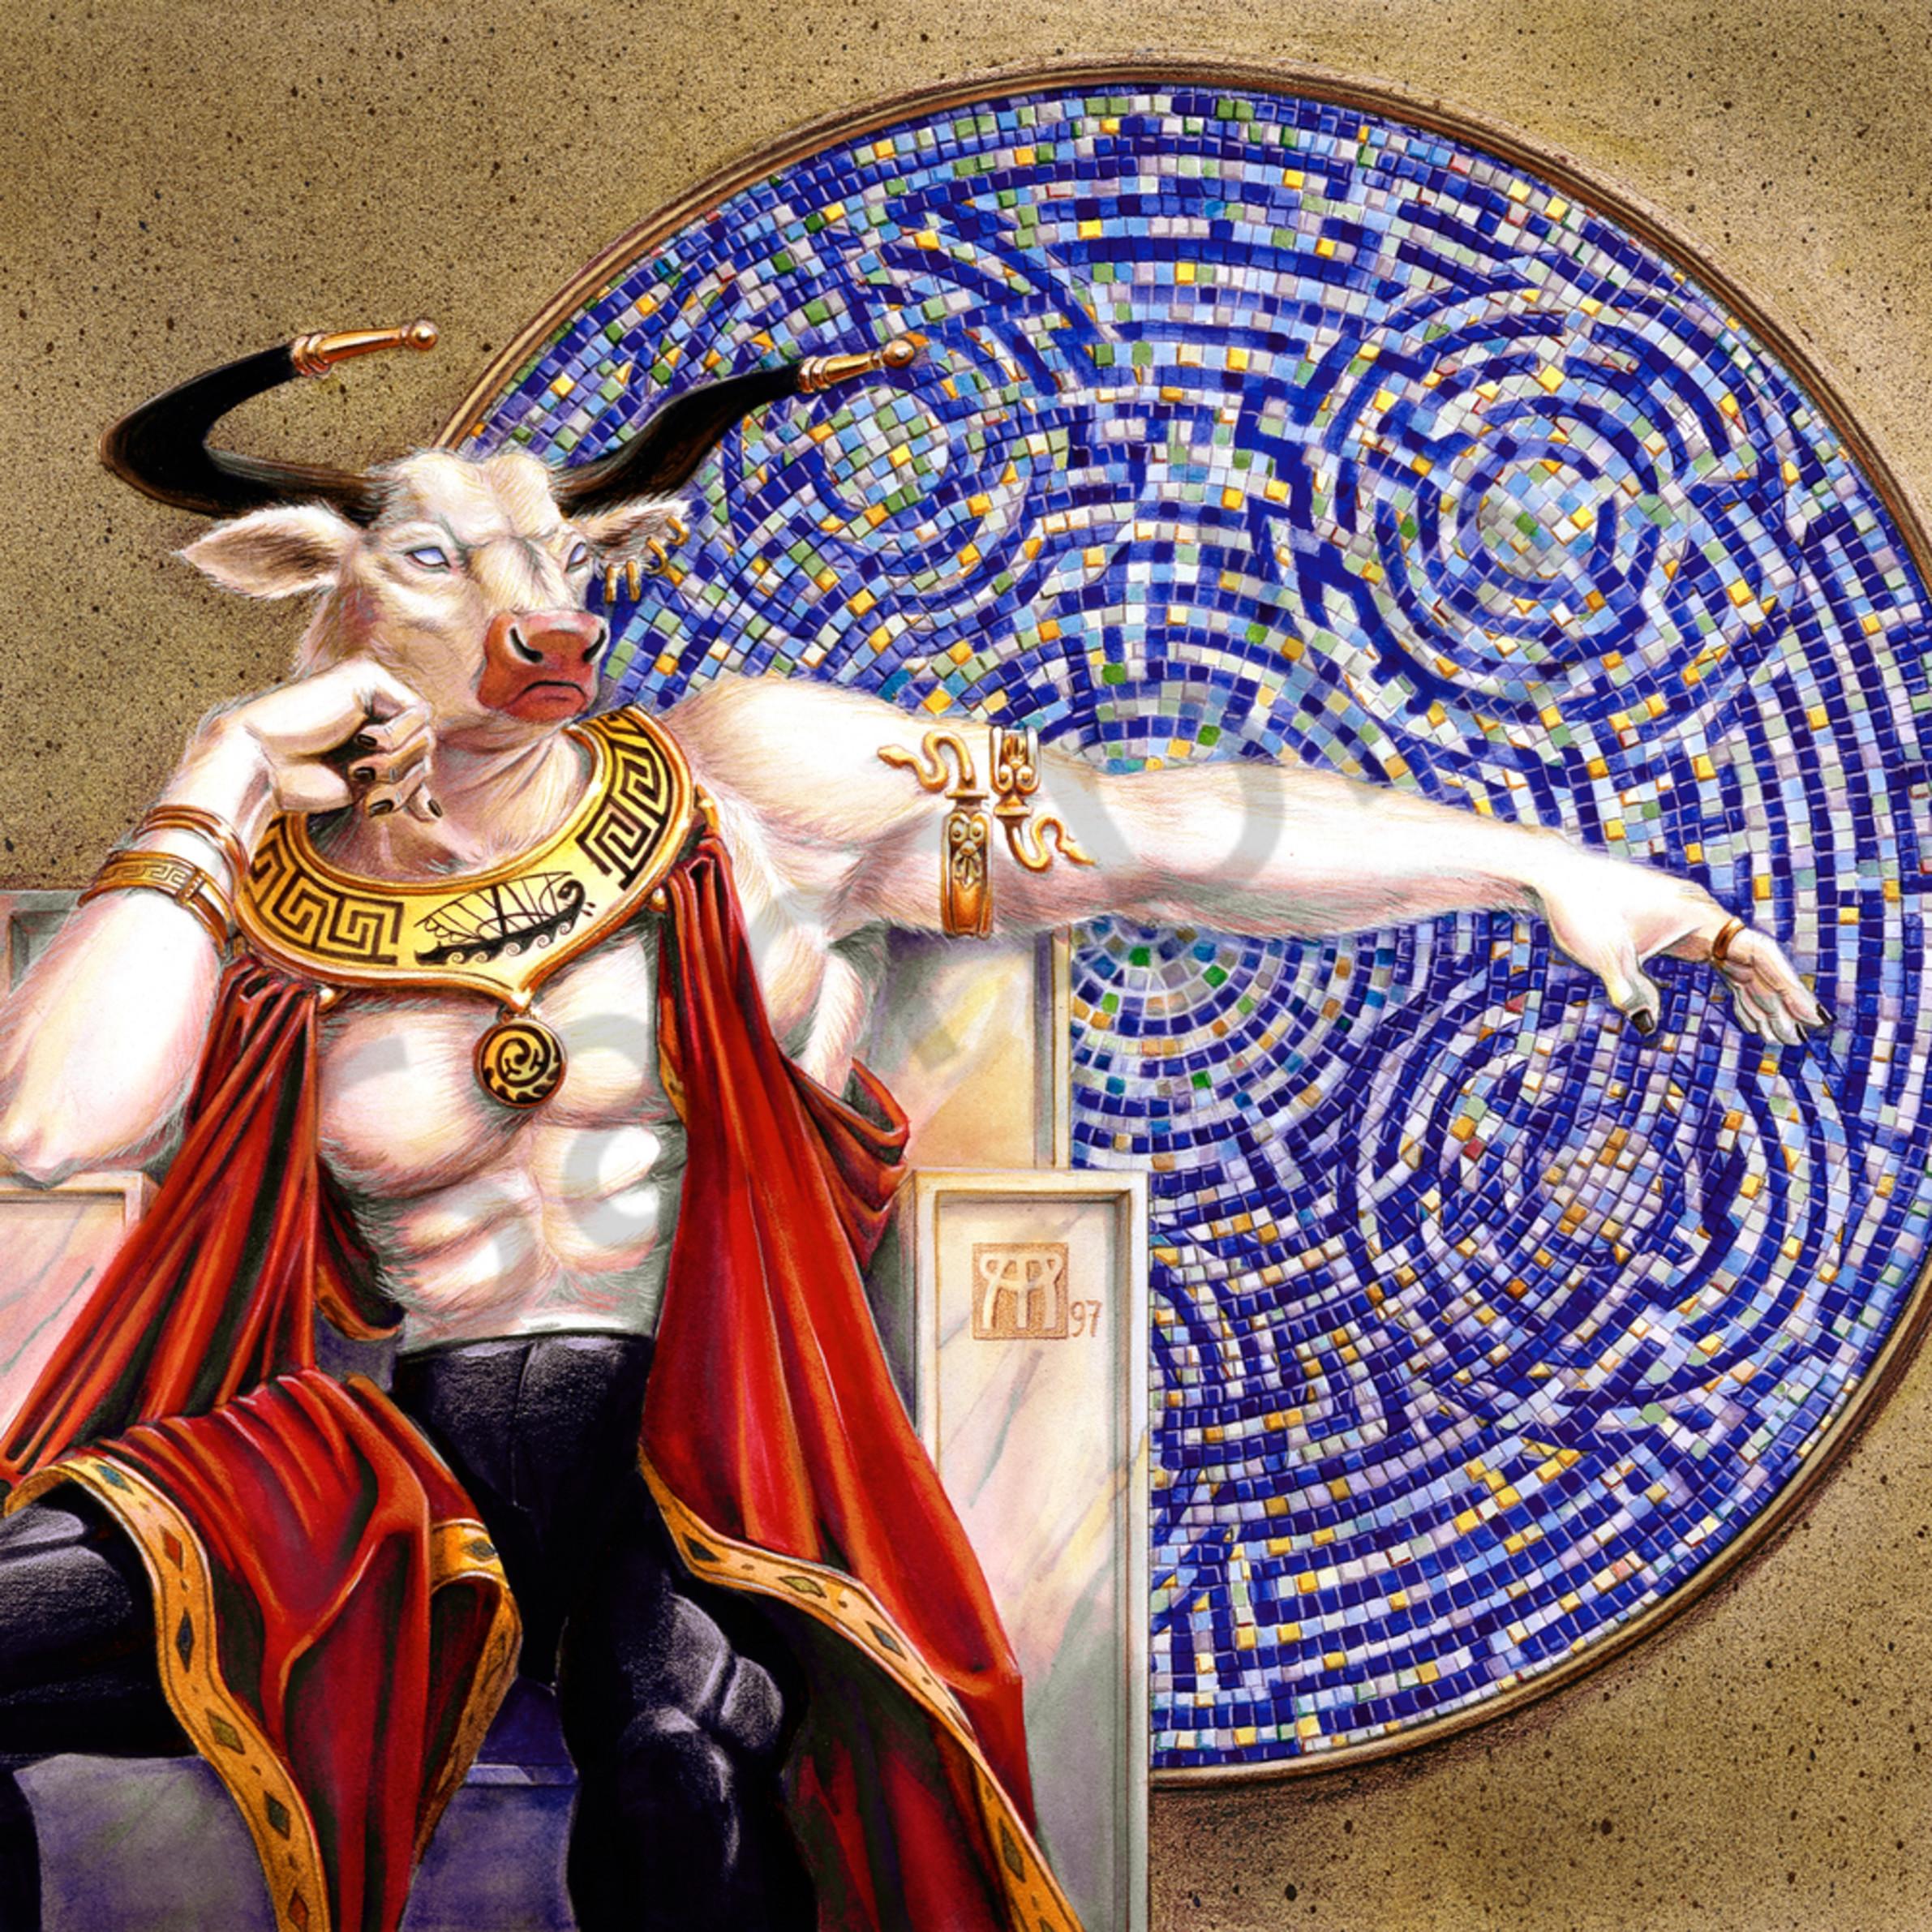 Minotaur with mosaic oj9oem